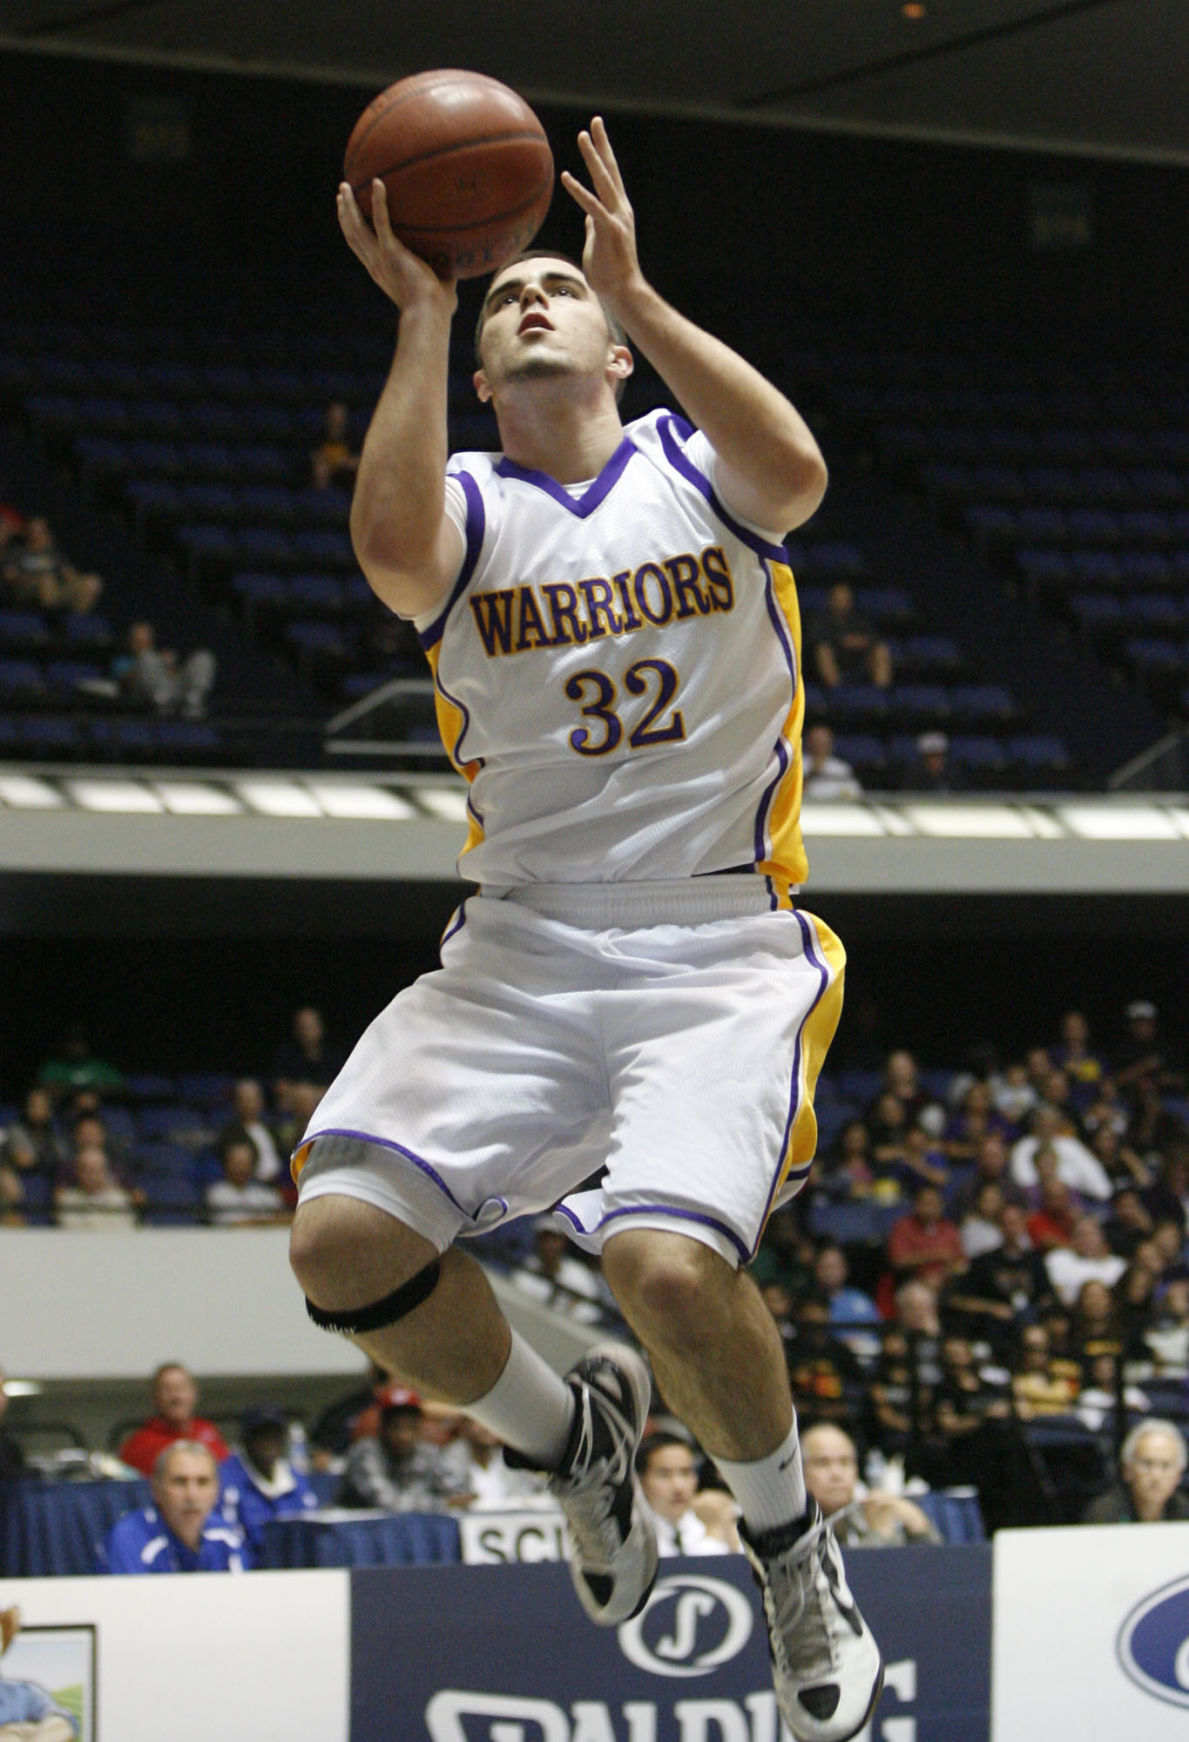 Ryan McGready 2